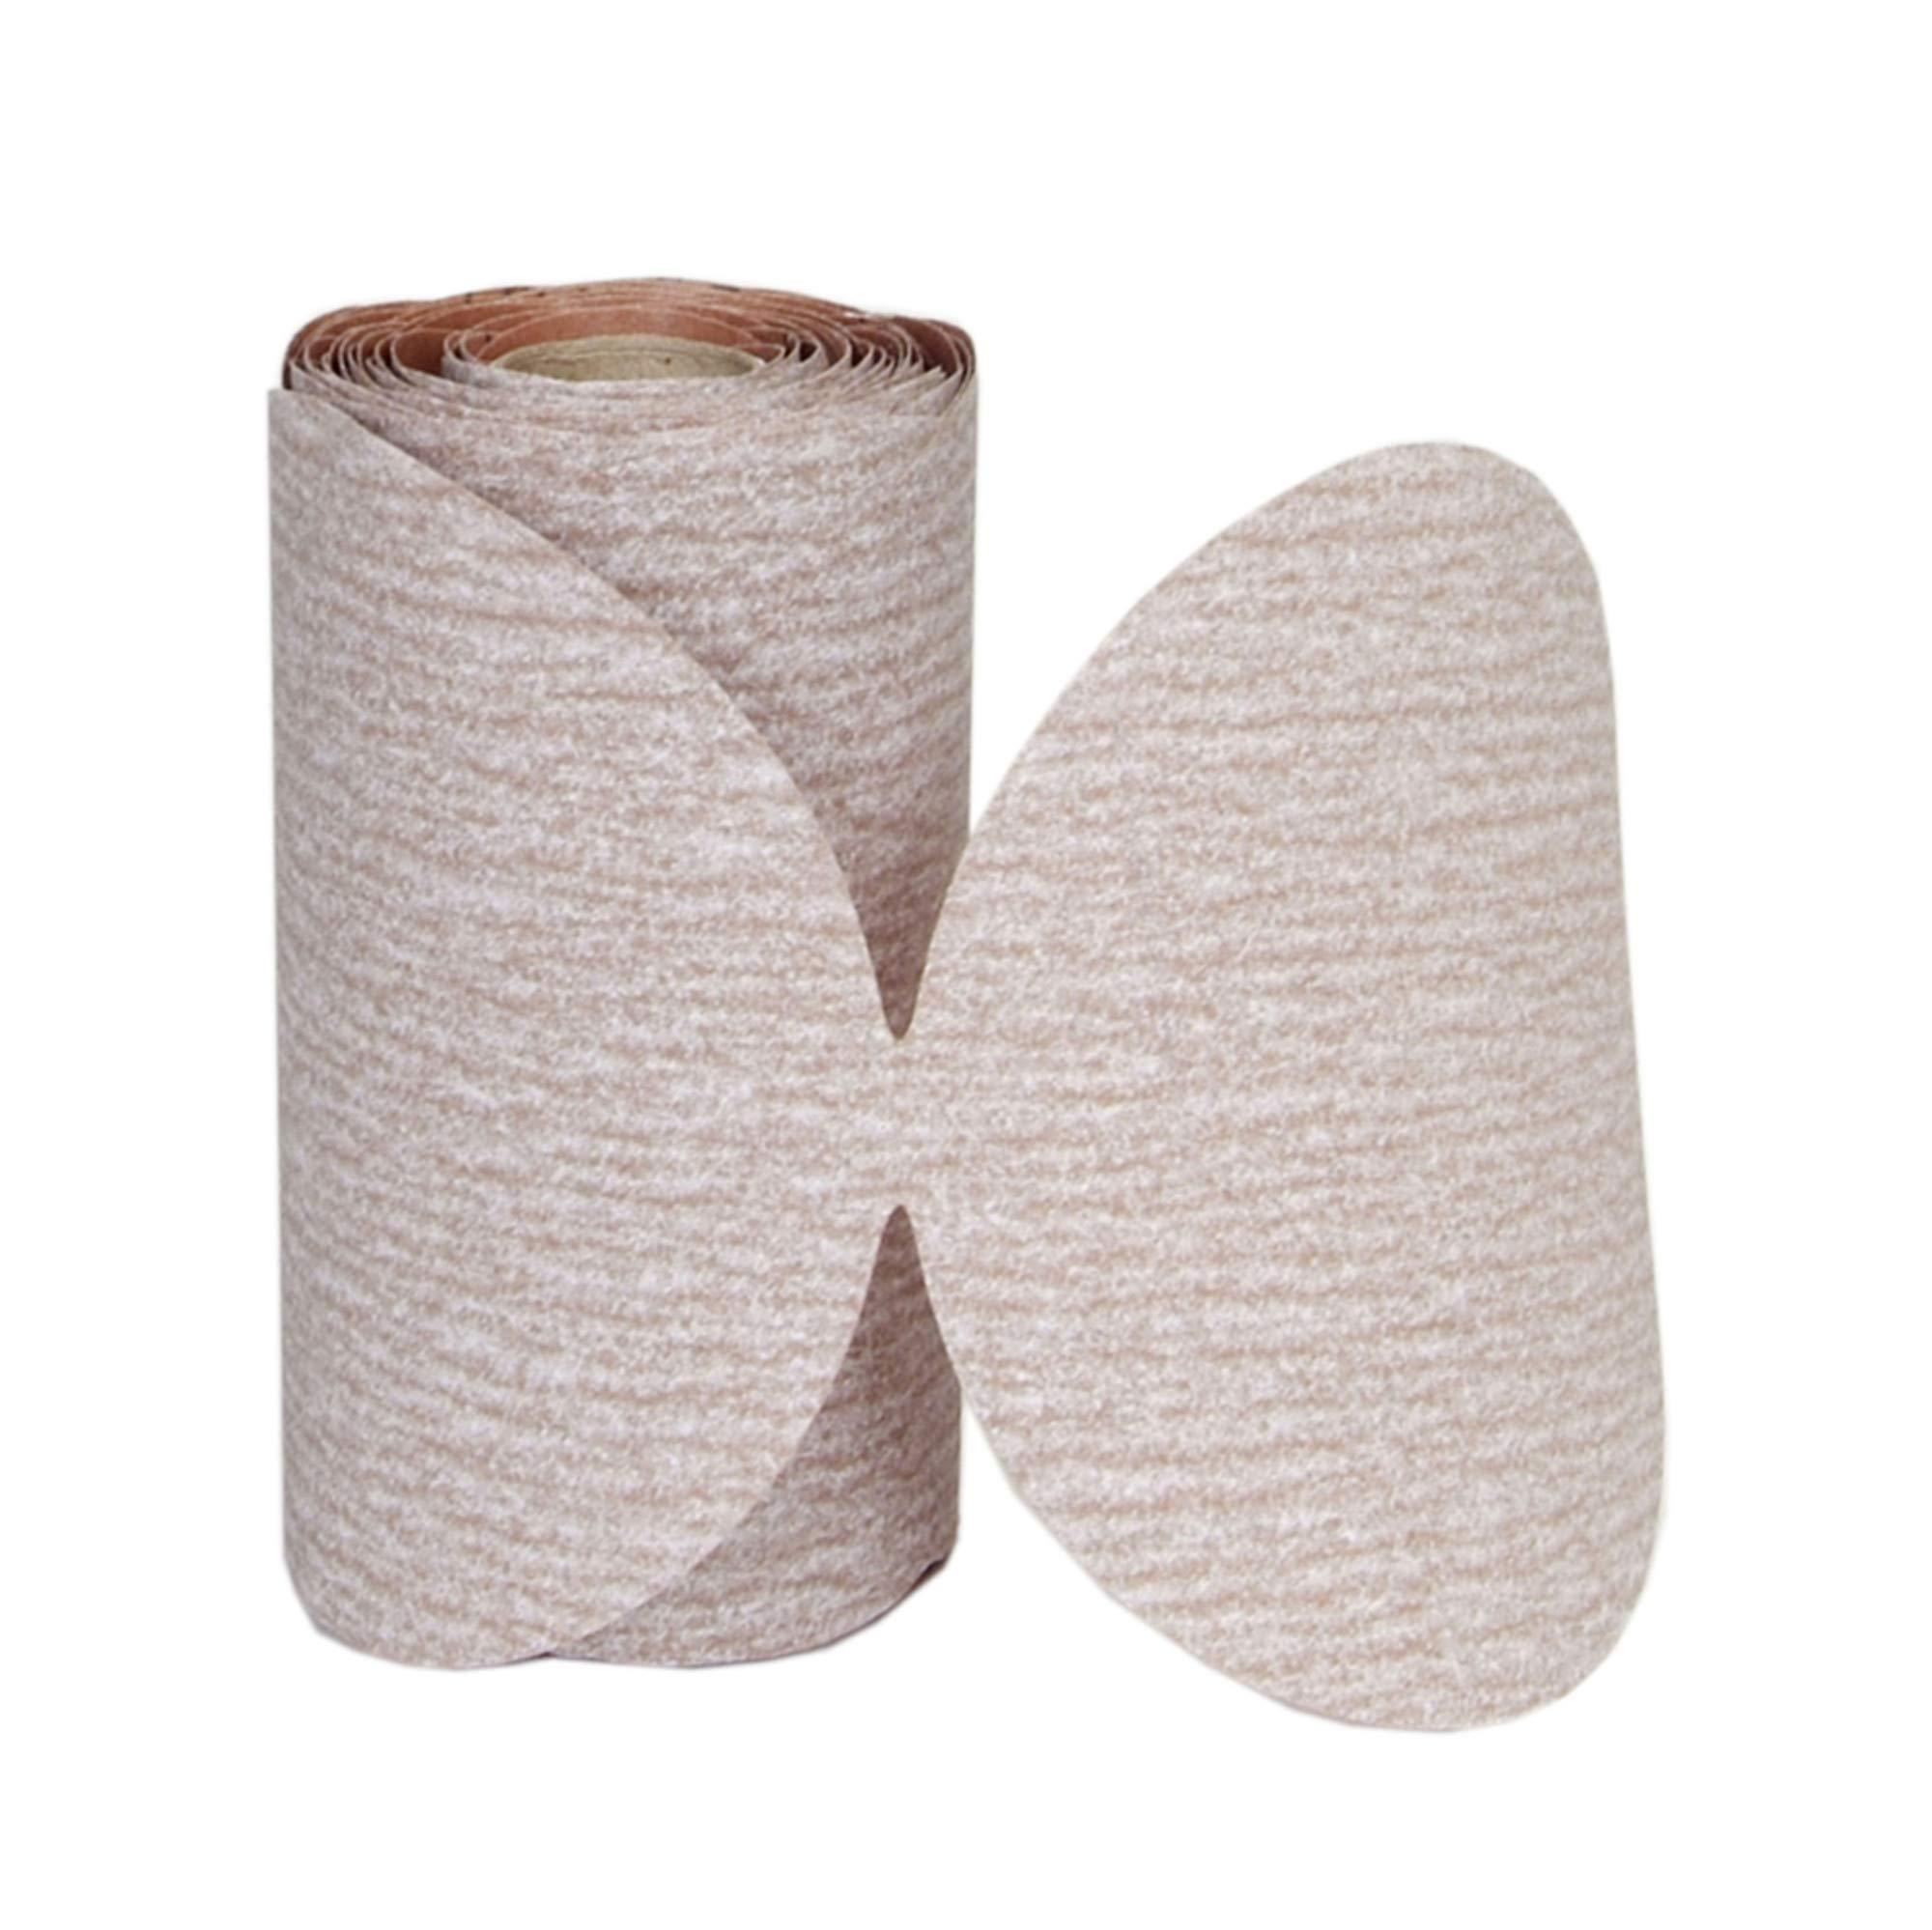 Norton A275 No-Fil Adalox Paper Abrasive Disc, Fiber Backing, Pressure-Sensitive Adhesive, Aluminium Oxide, 3-1/2'' Diameter, Grit 220 (Roll of 100)